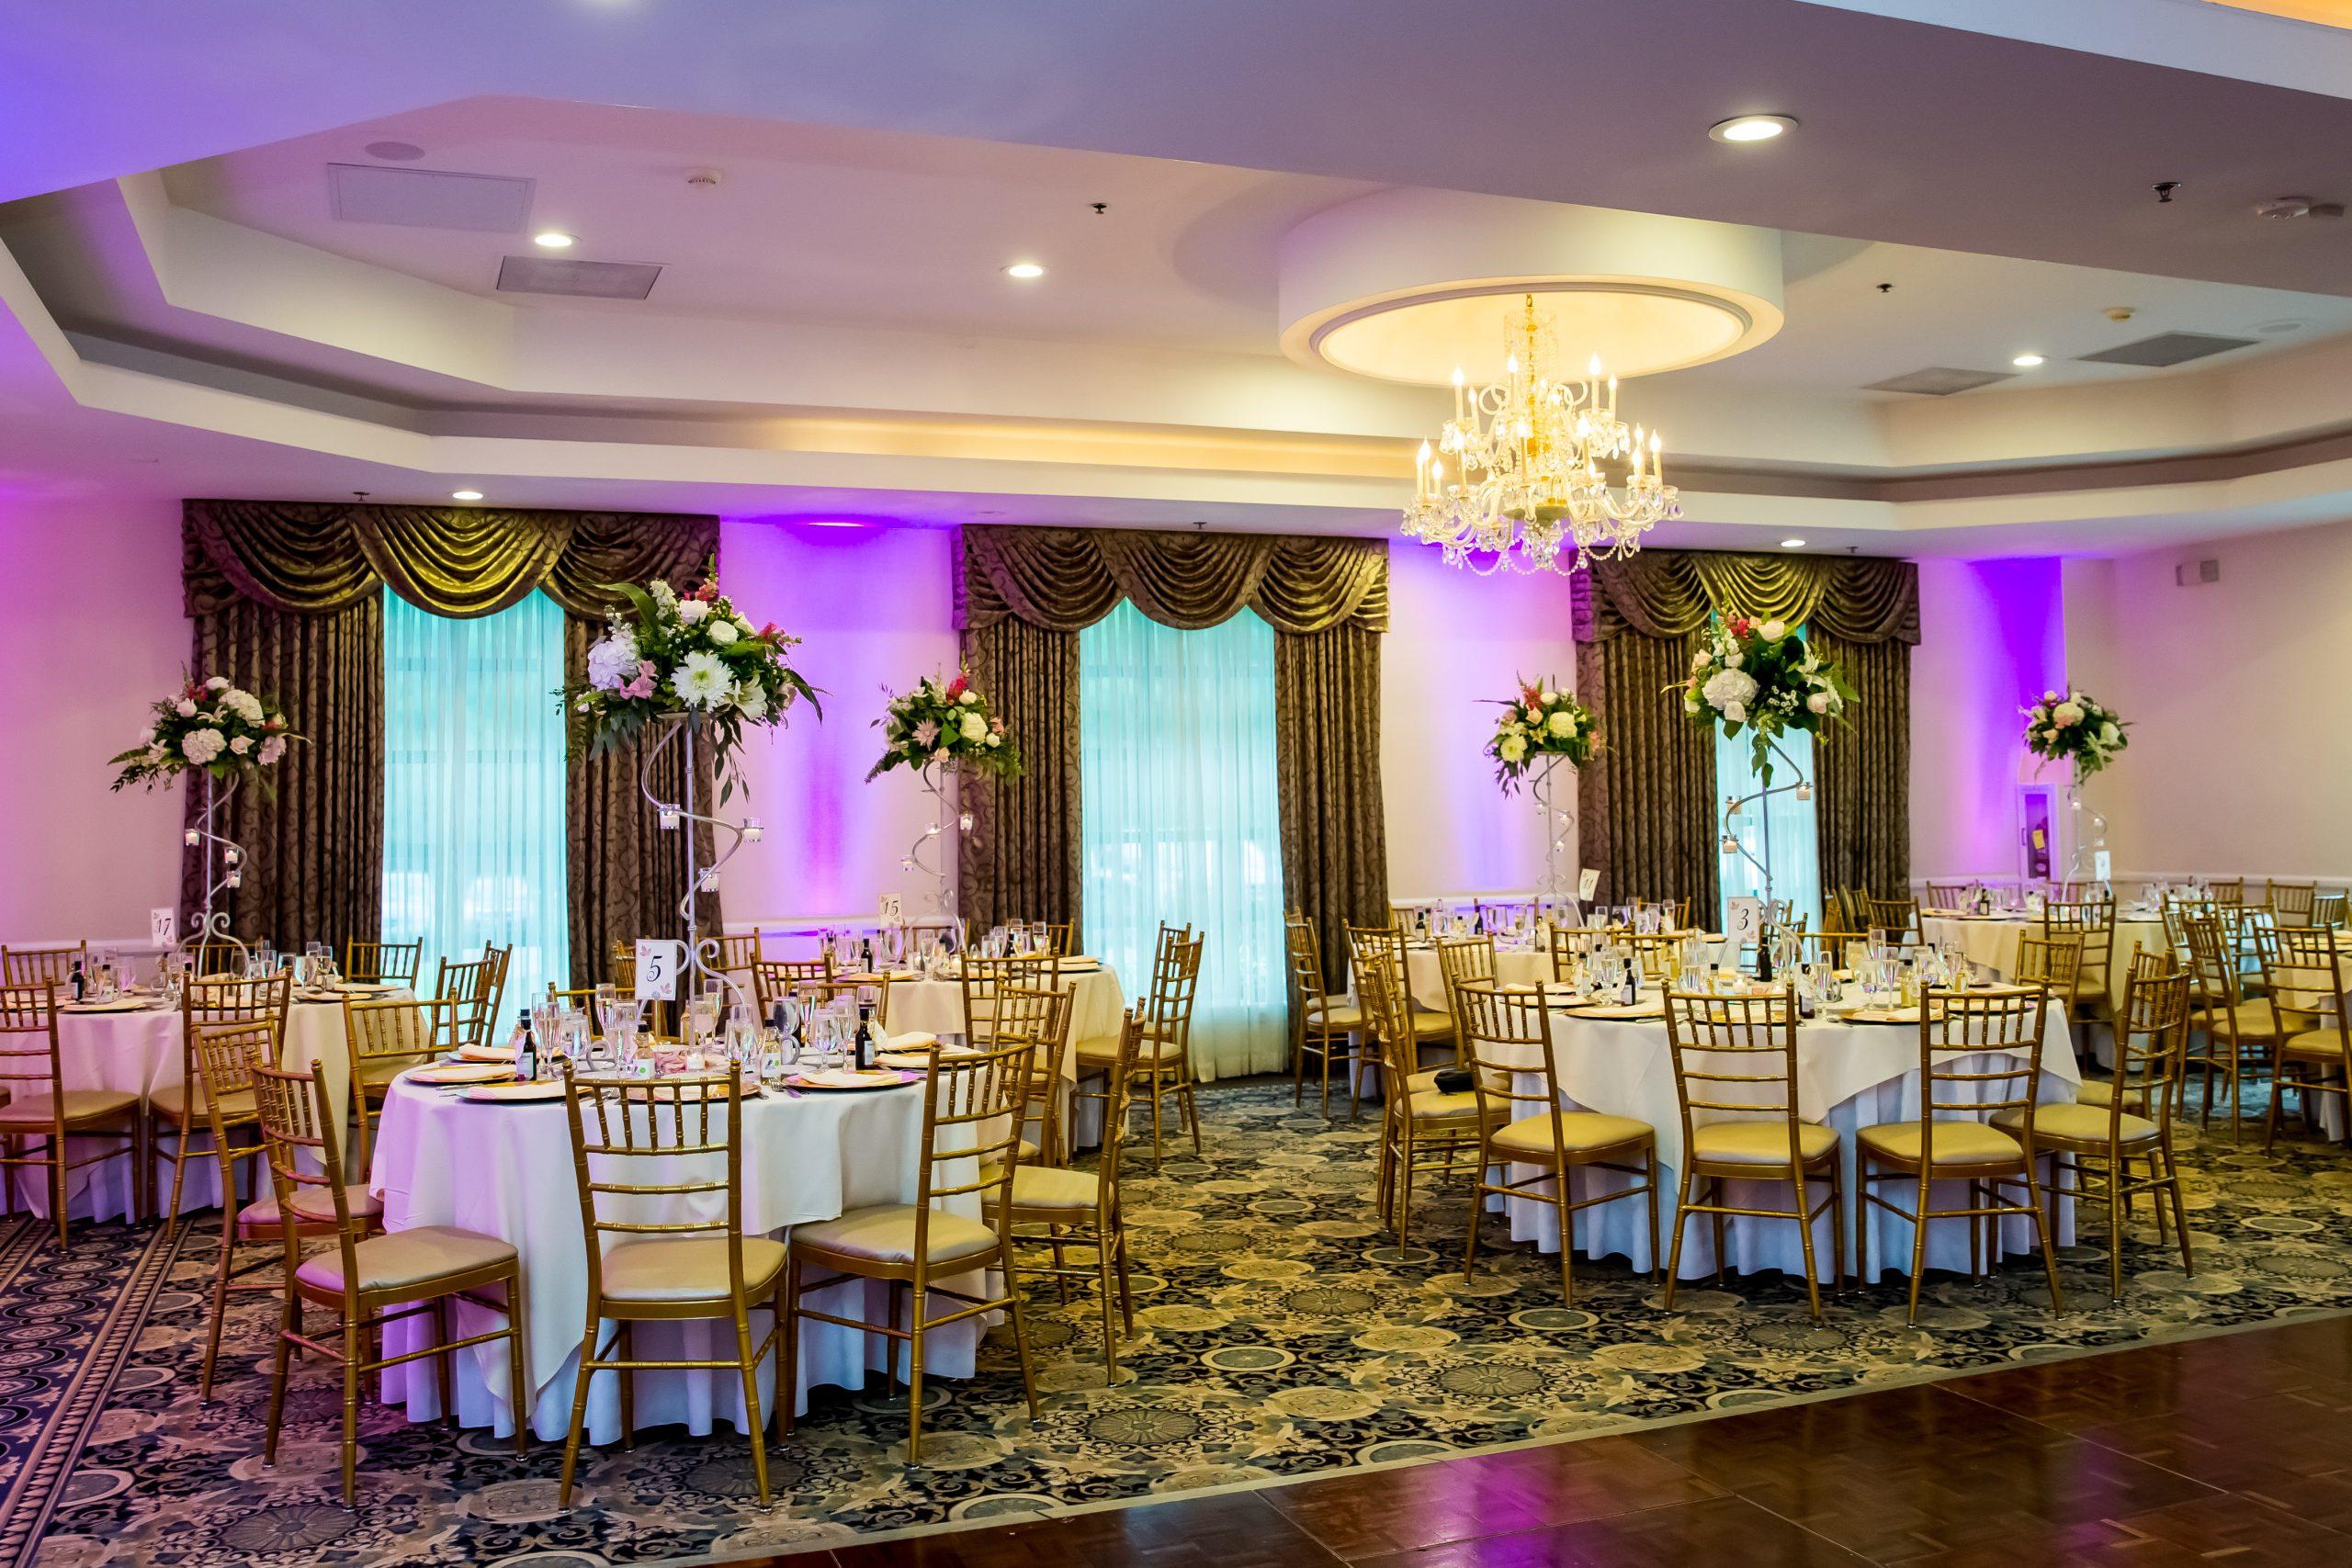 Victori_Rob_Mohawk River Country Club Wedding-44.jpg